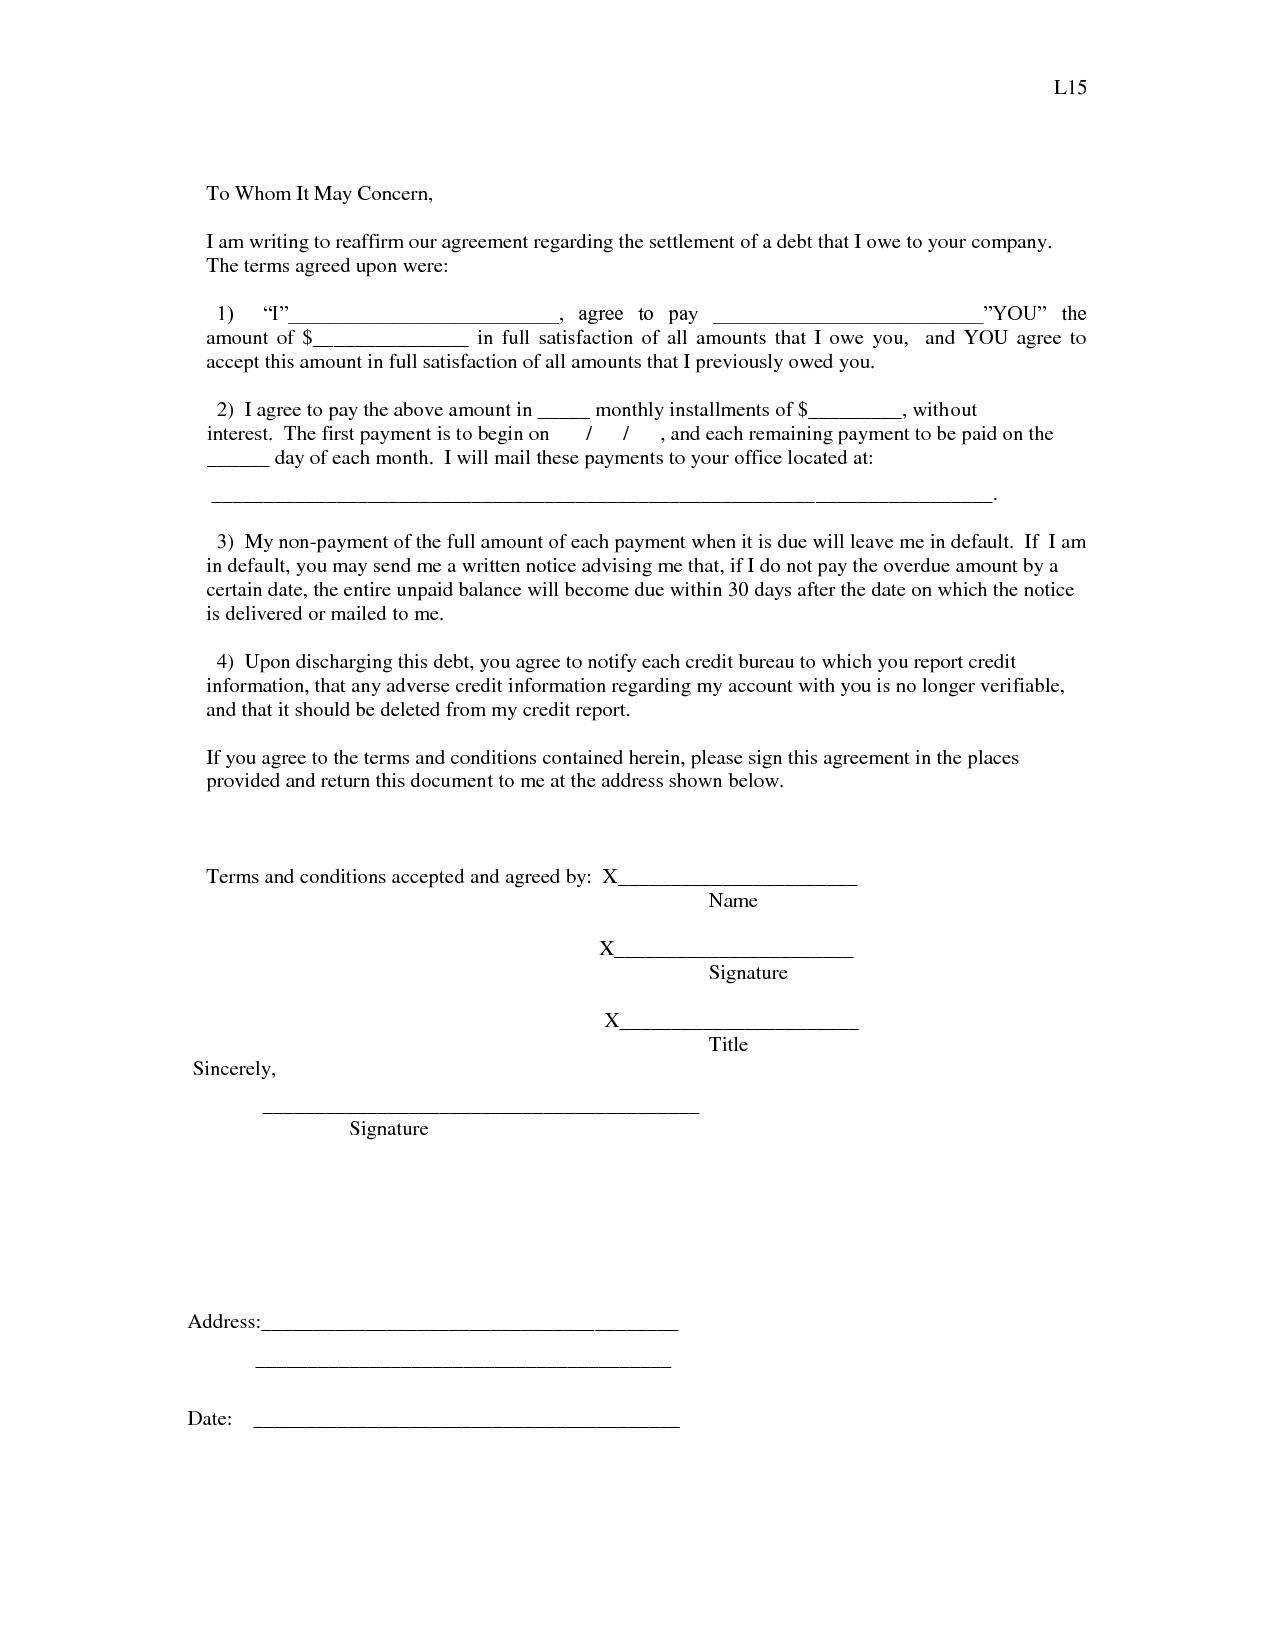 Credit Report: Settlement Agreement Credit Report - i owe you ...